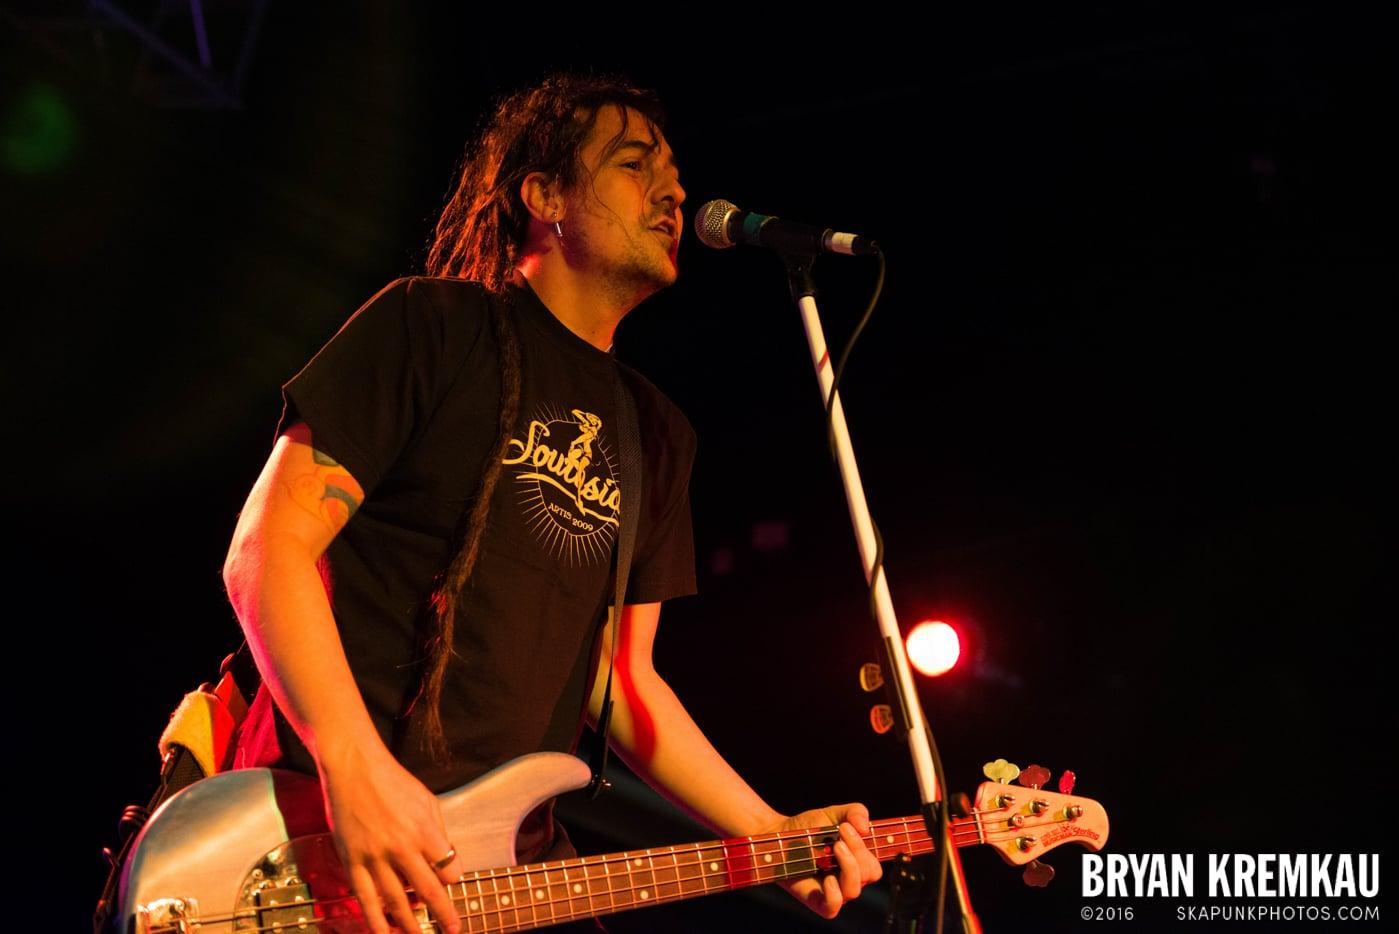 Less Than Jake @ Starland Ballroom, Sayreville, NJ - 11.9.13 (20)